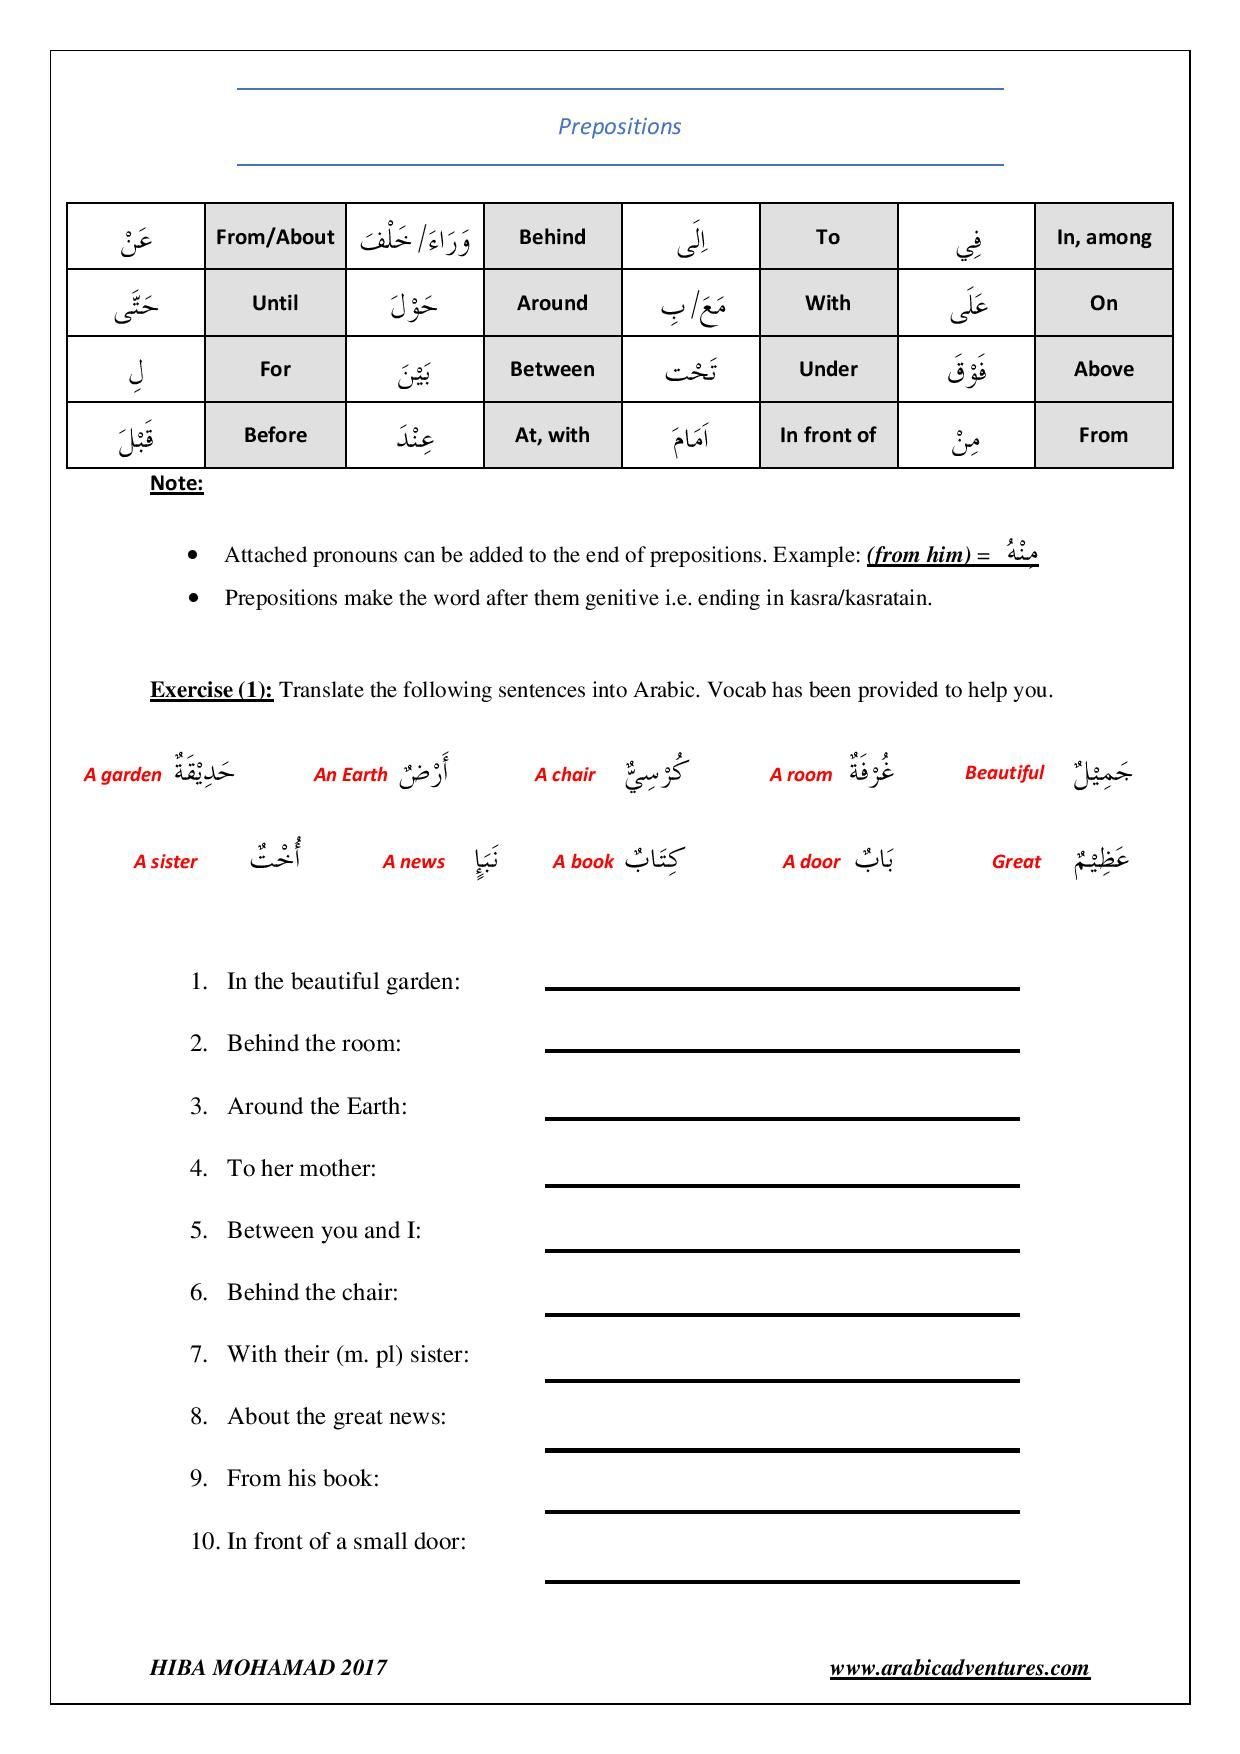 medium resolution of Prepositions worksheet www.arabicadventures.com   Grammar worksheets